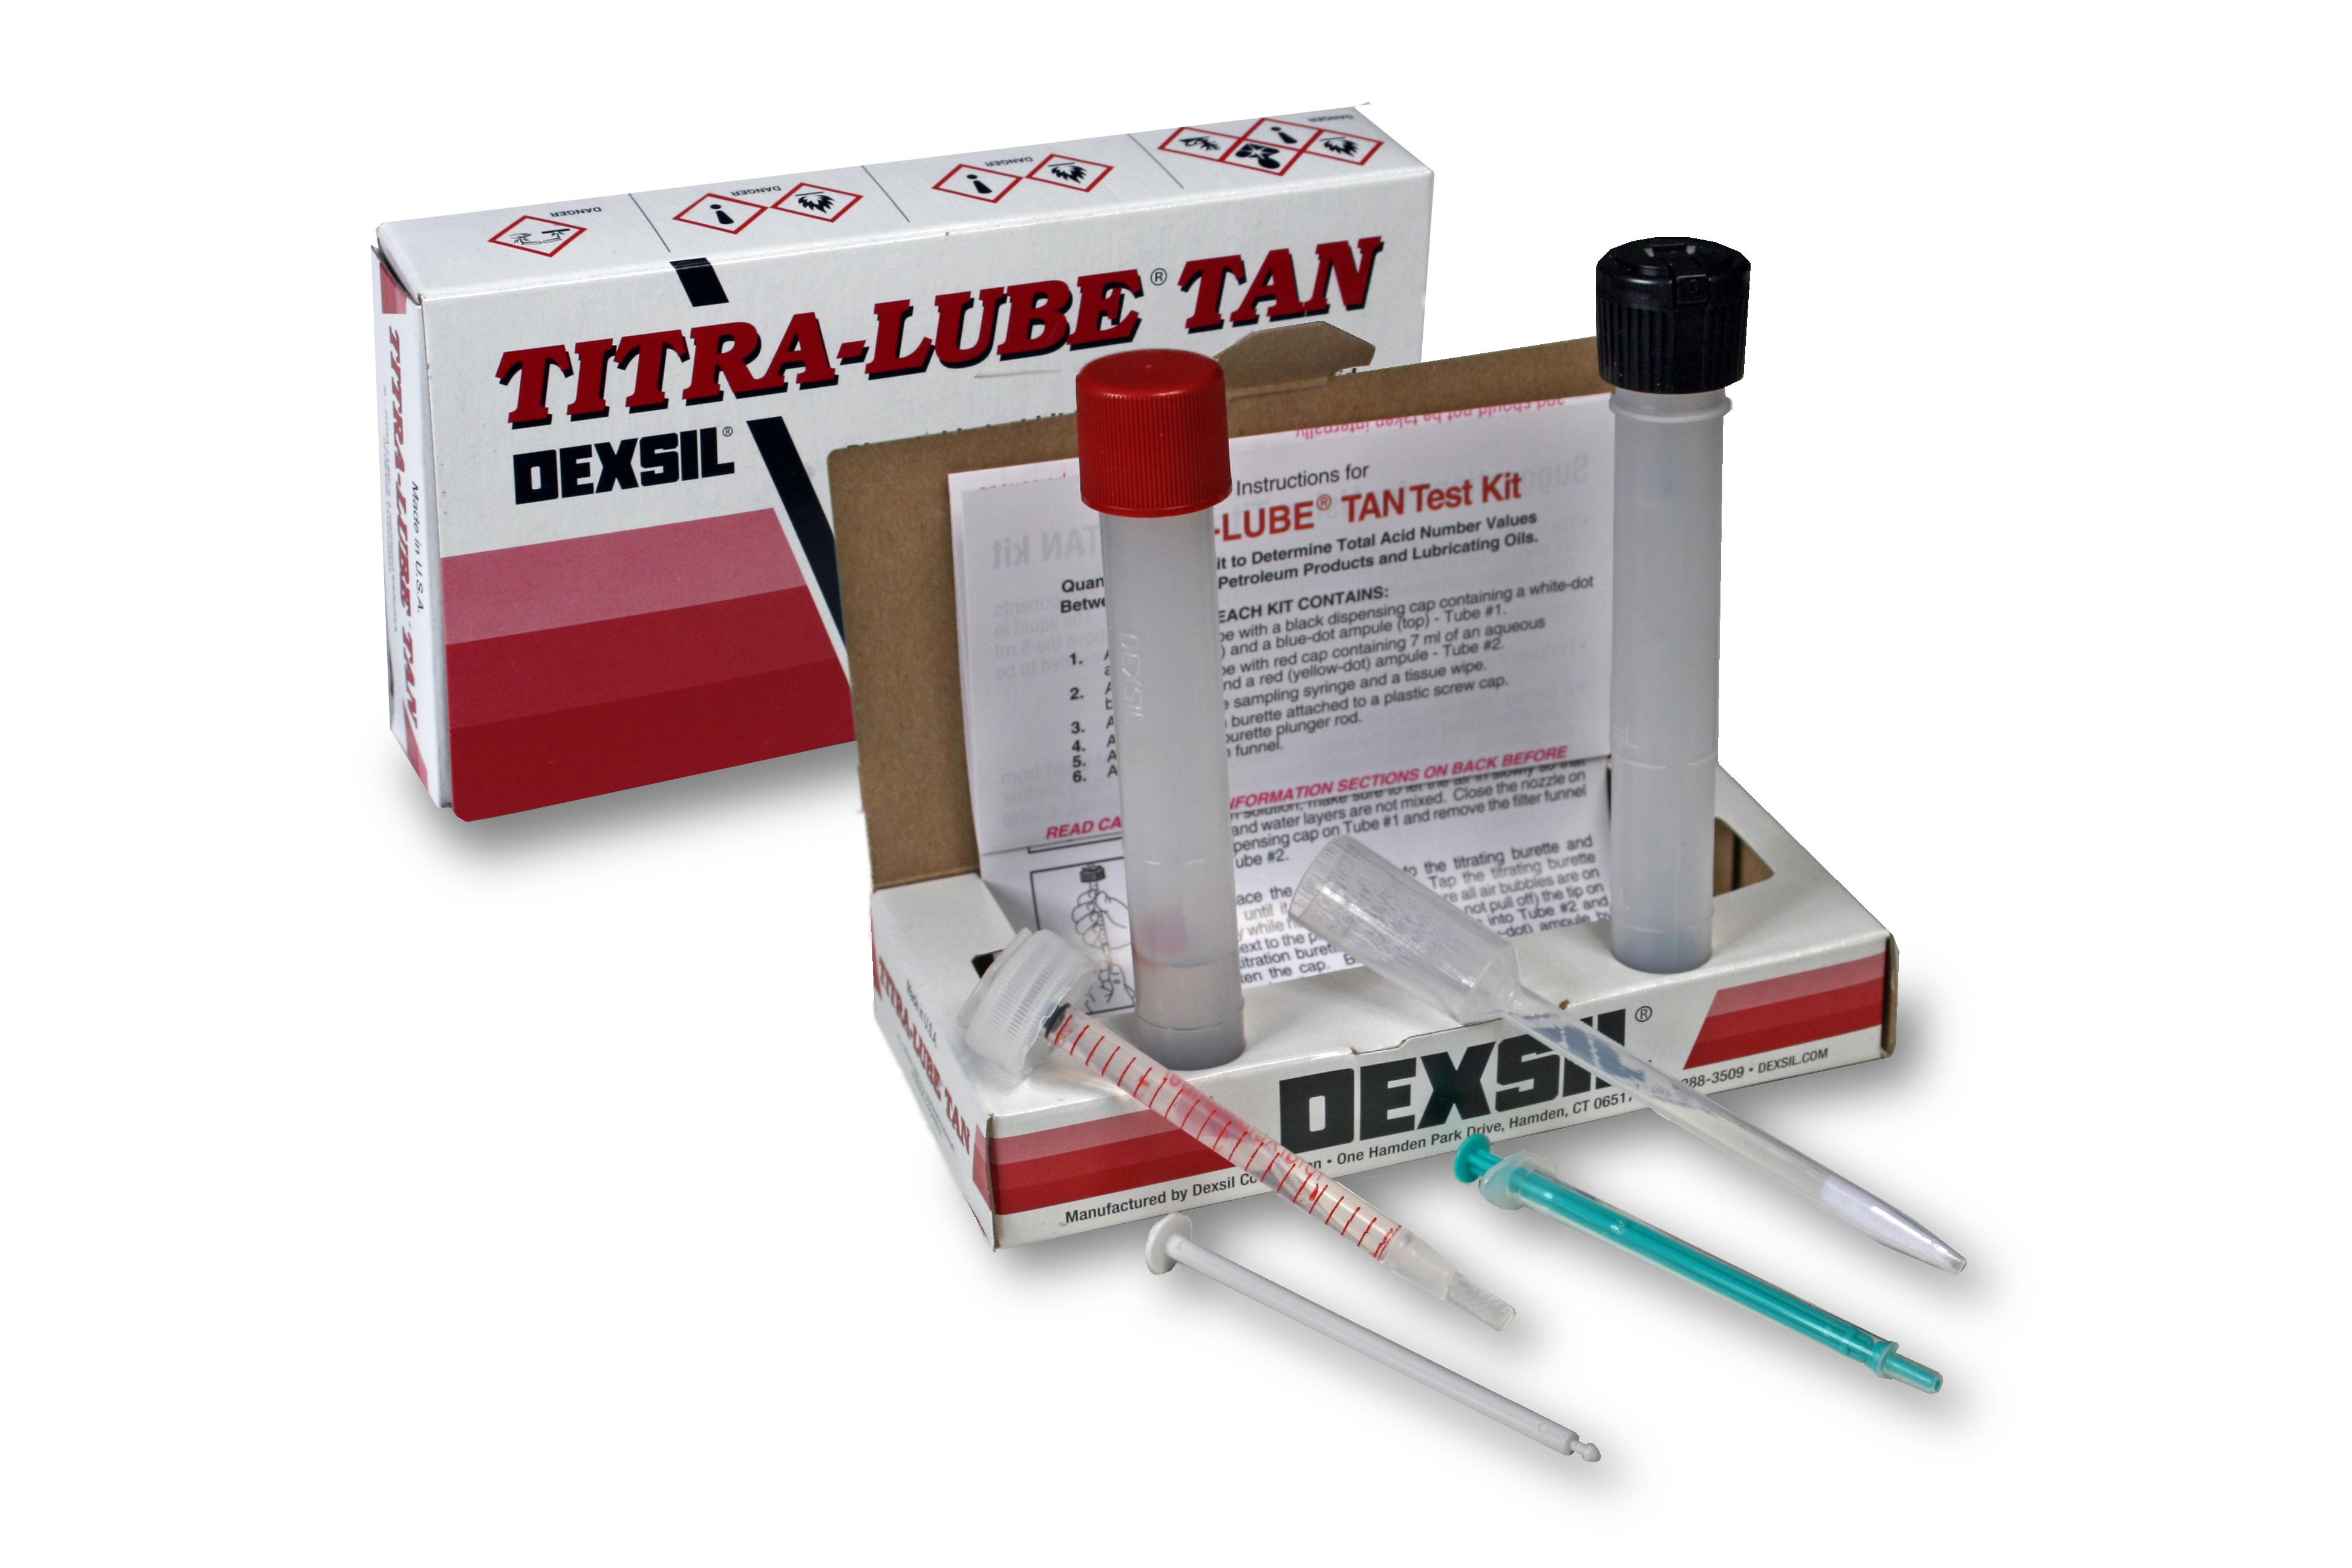 TitraLube® TAN - Dexsil